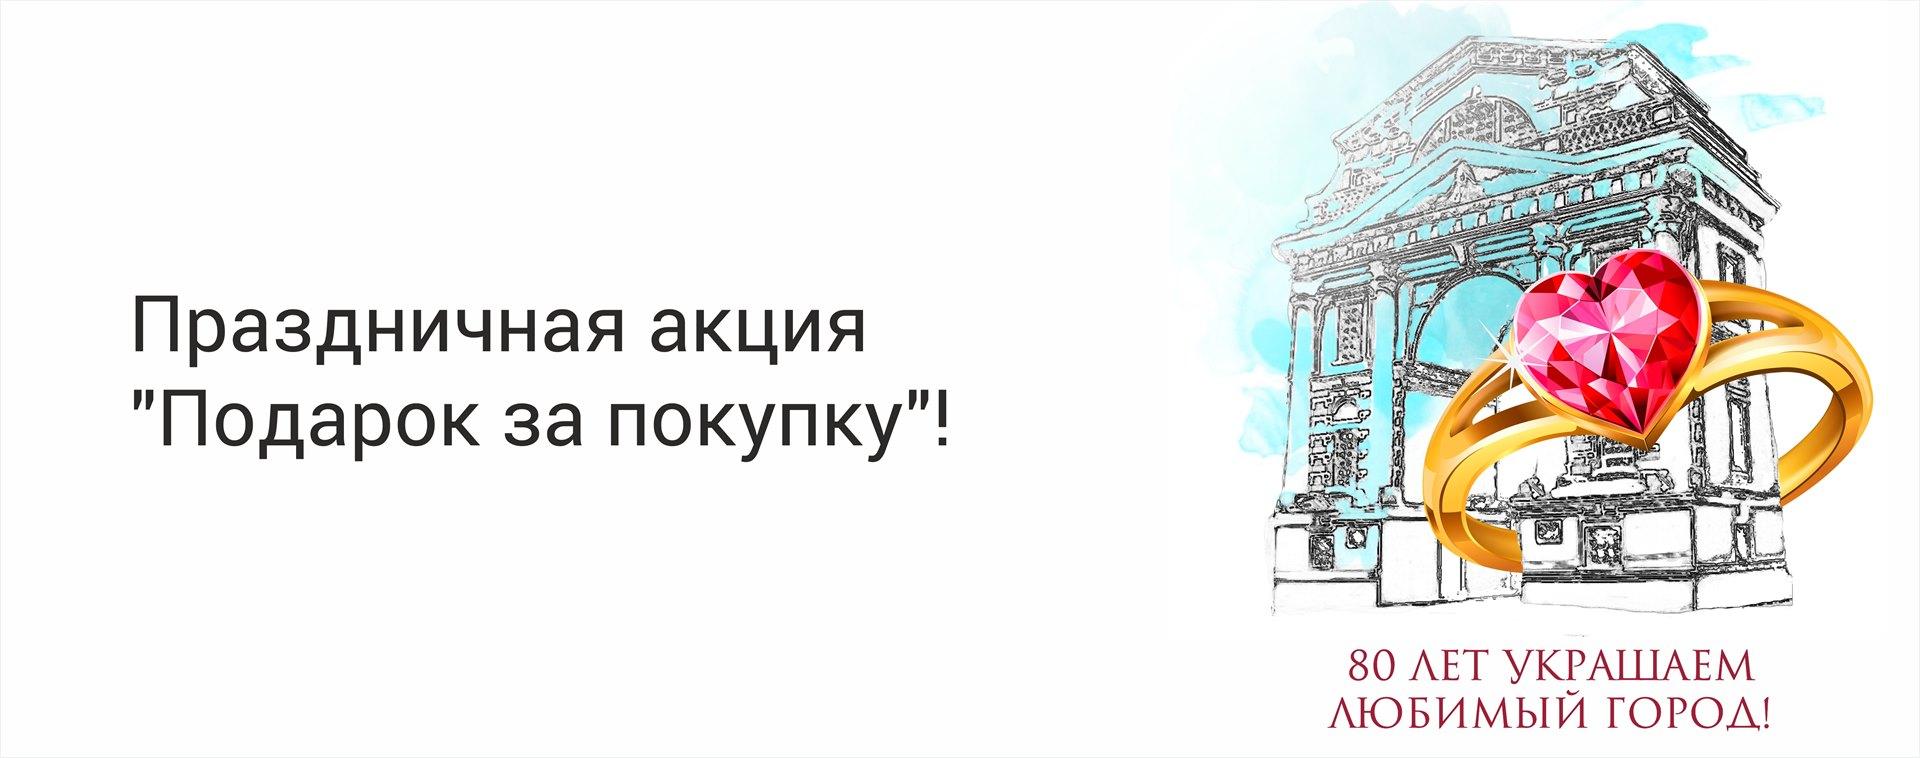 https://www.almazcom.ru/pub/img/QA/actions/kalendar_aktsiya.jpg